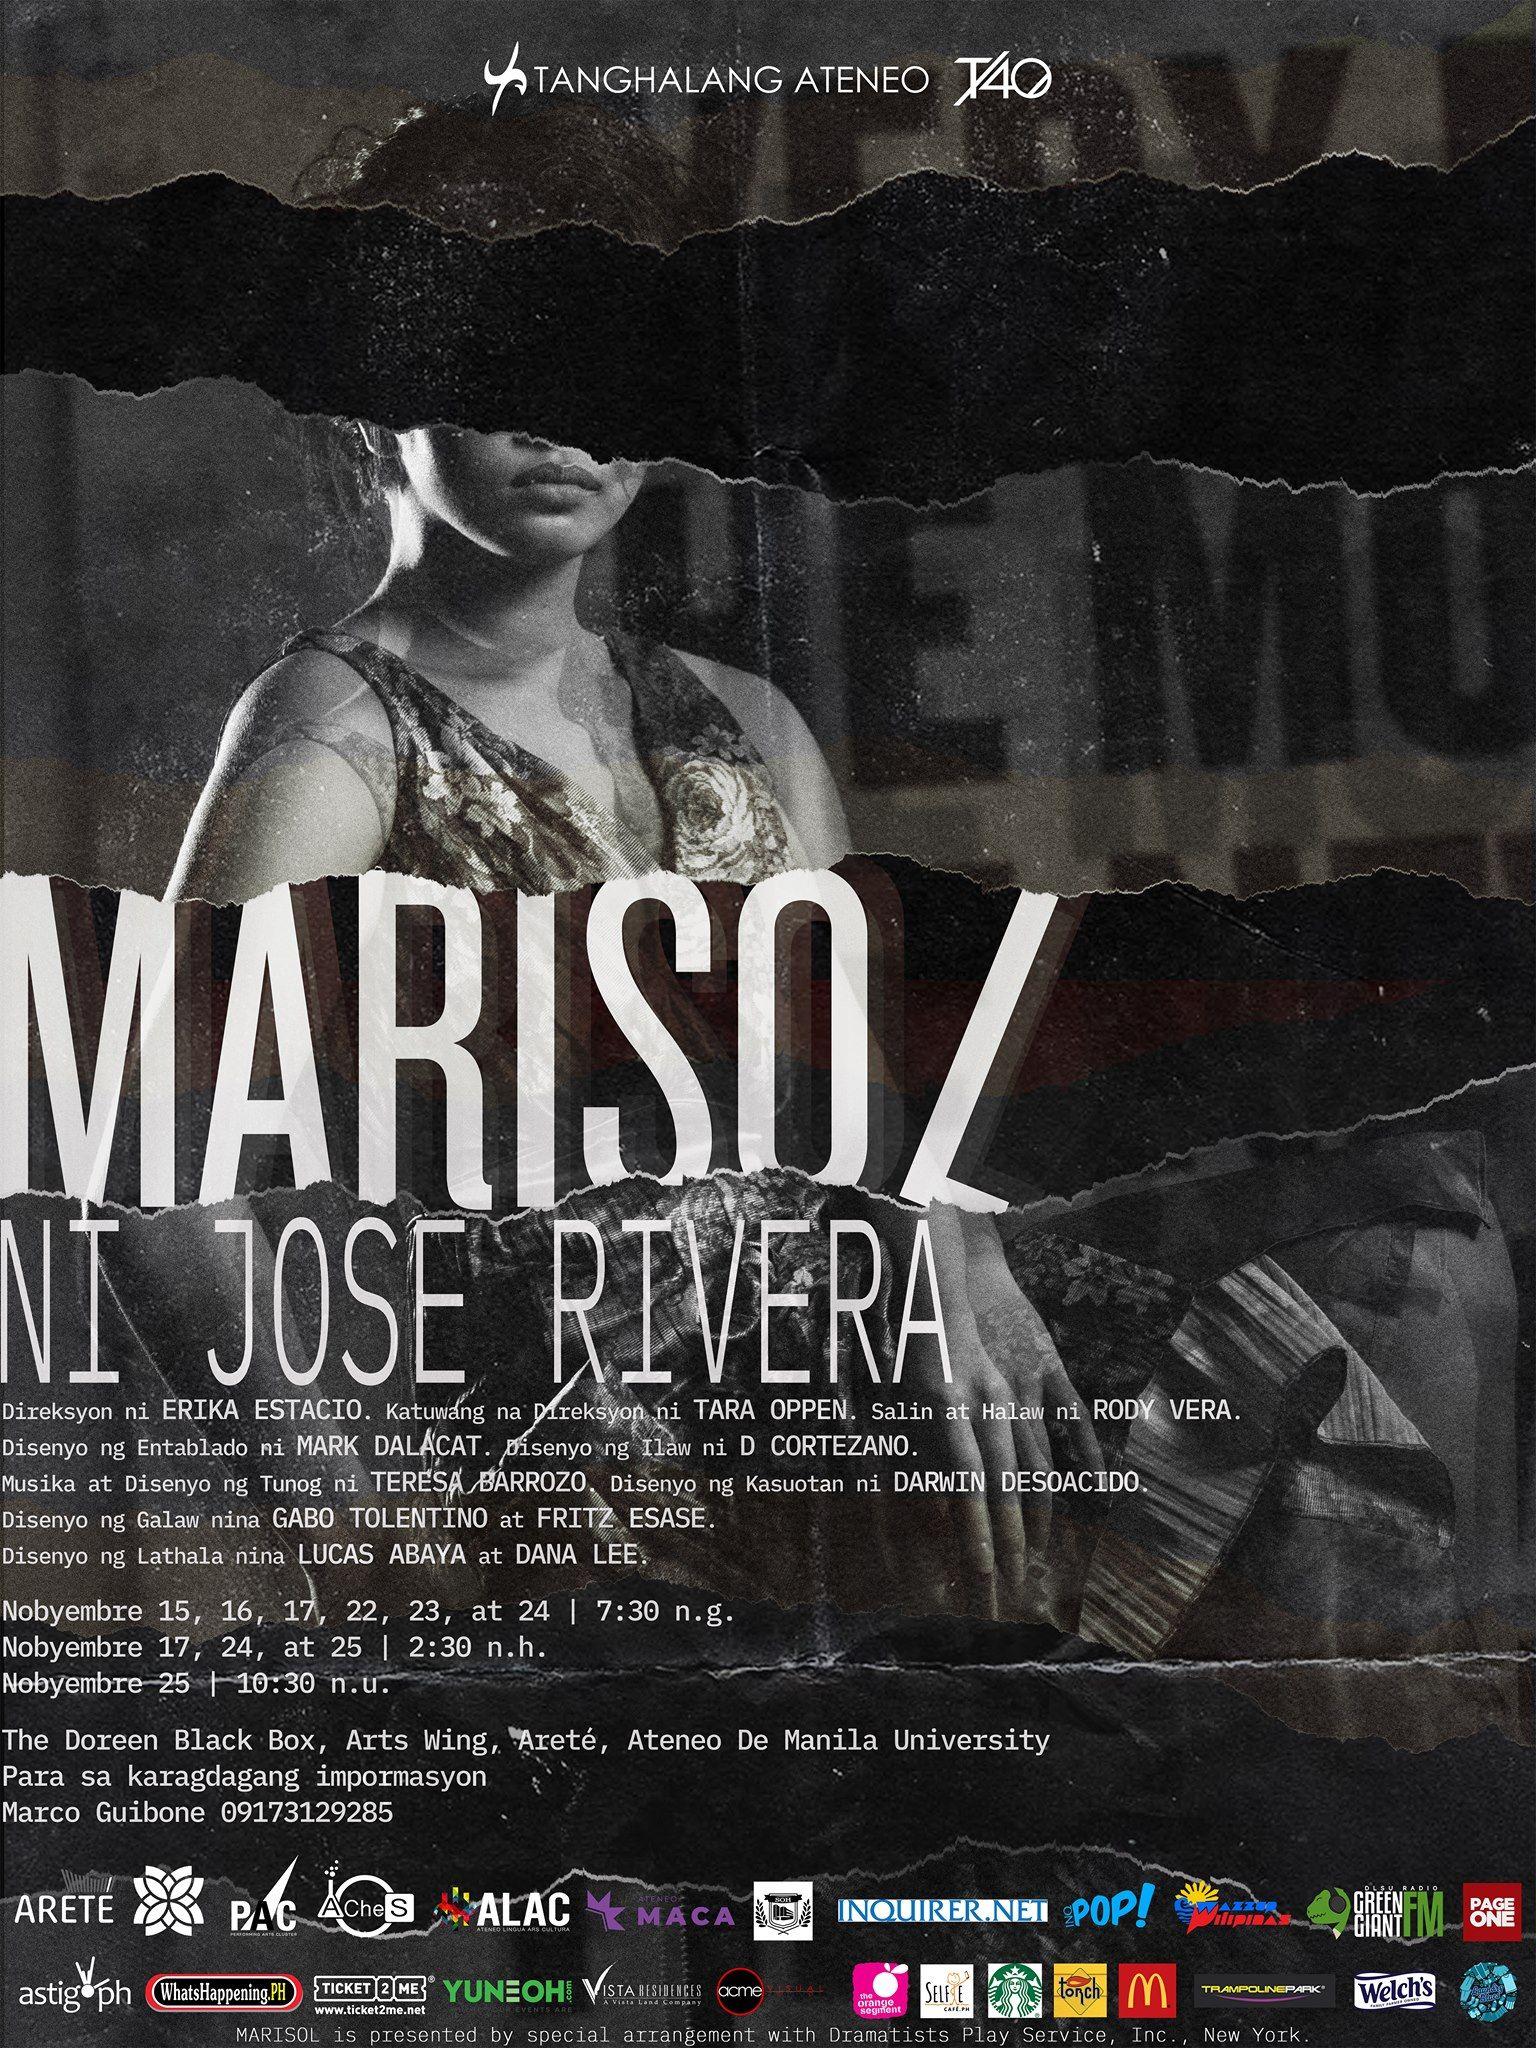 Marisol